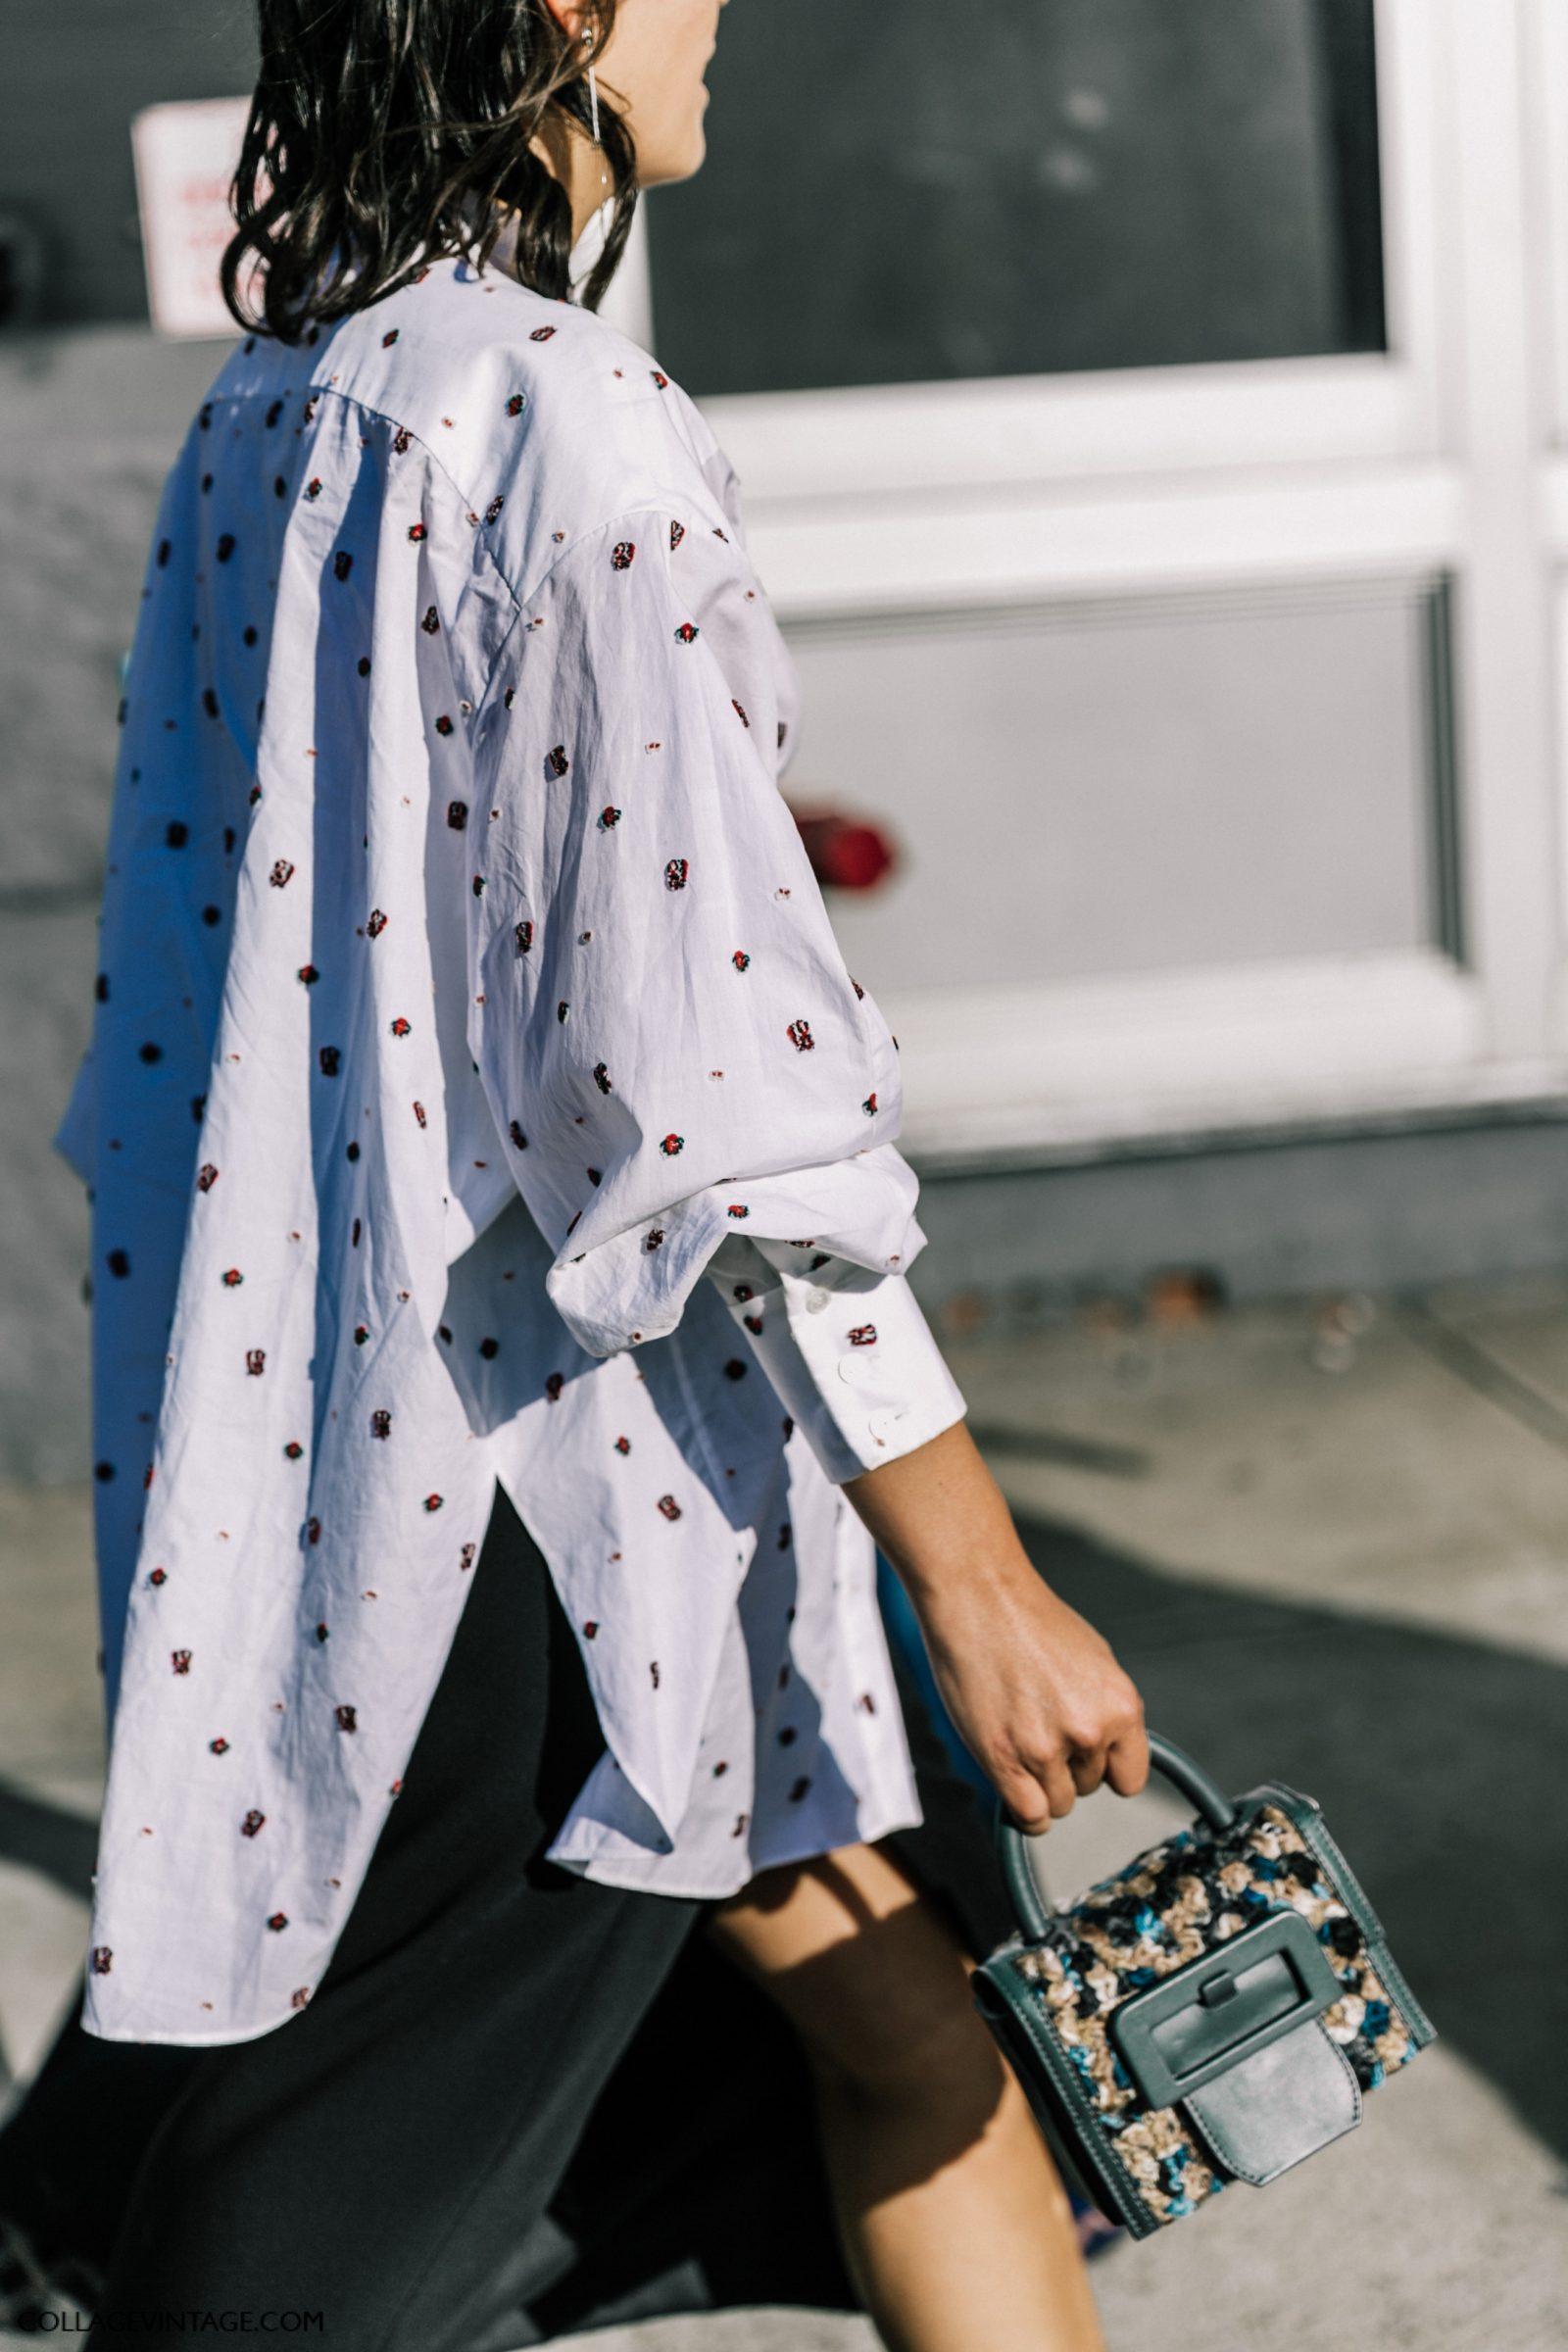 nyfw-new_york_fashion_week_ss17-street_style-outfits-collage_vintage-vintage-atuzarra-53